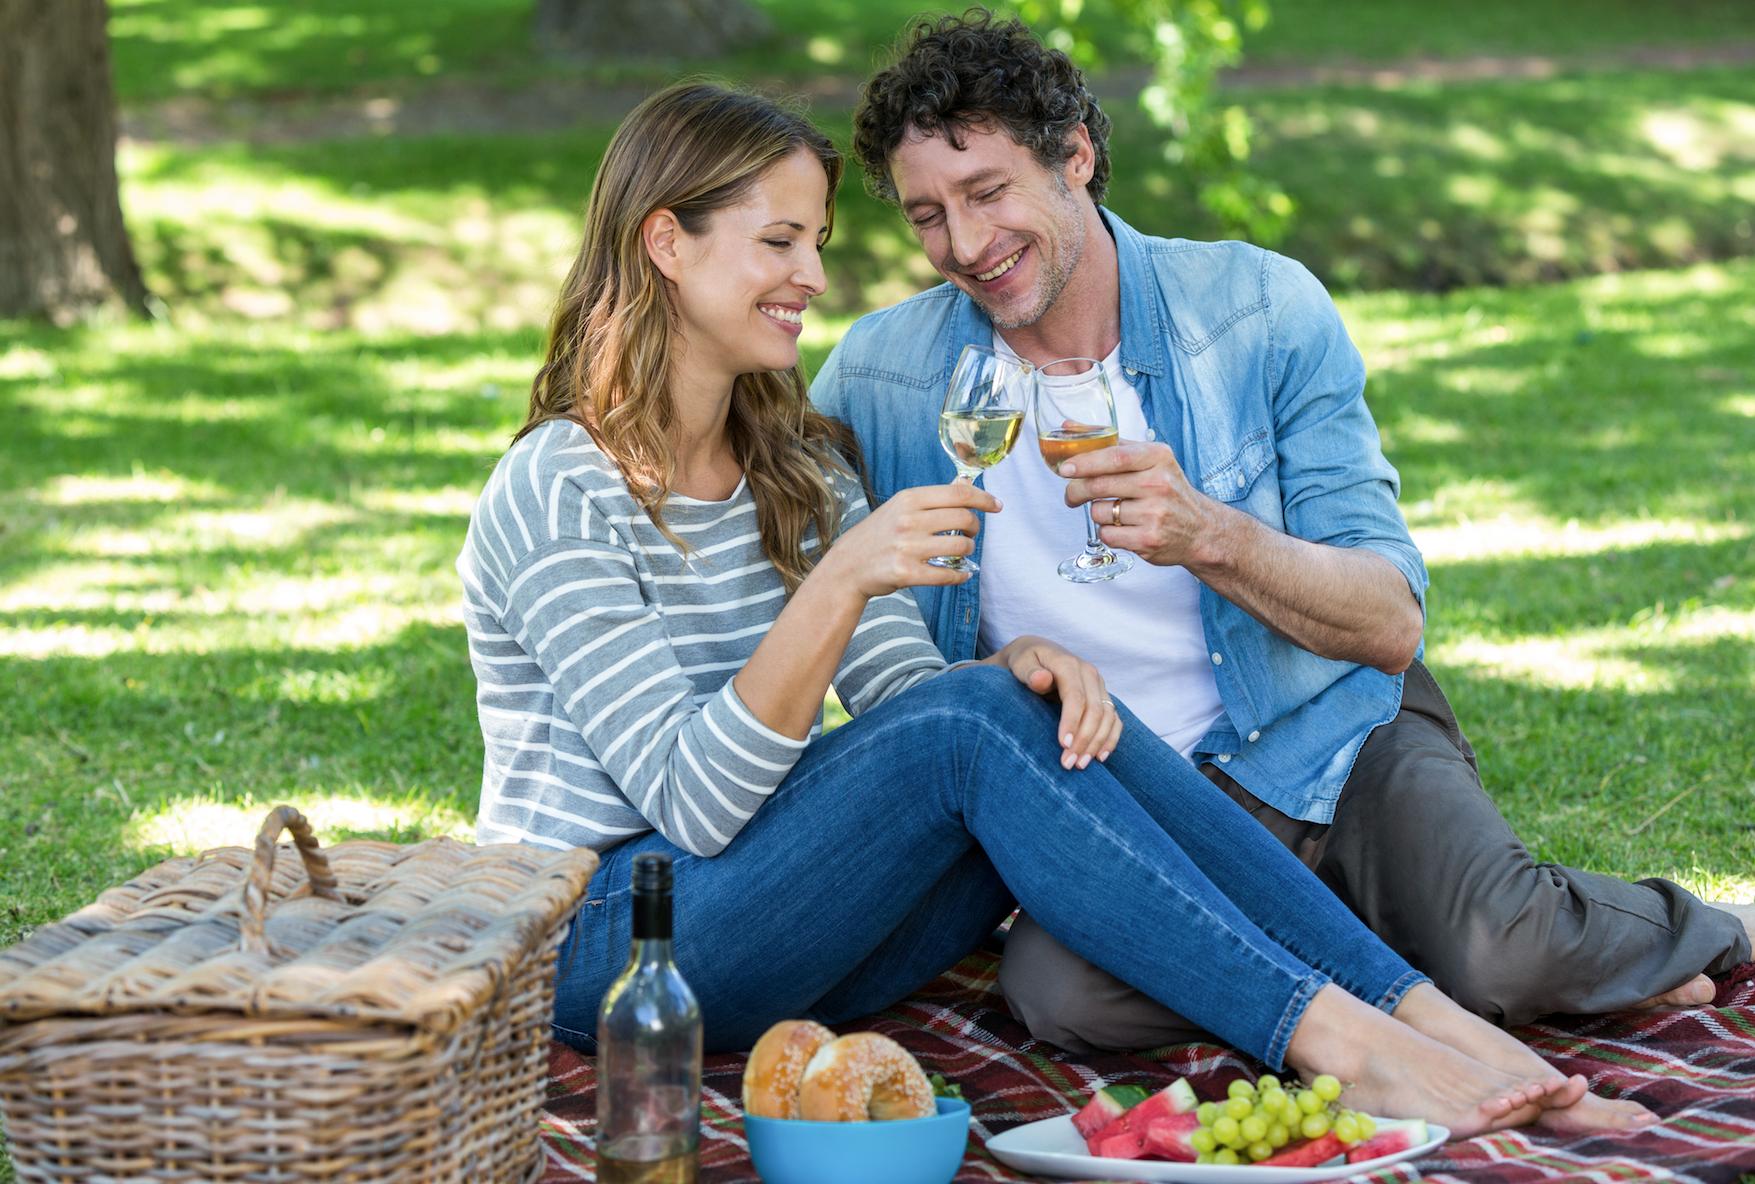 Man and woman having romantic park picnic date